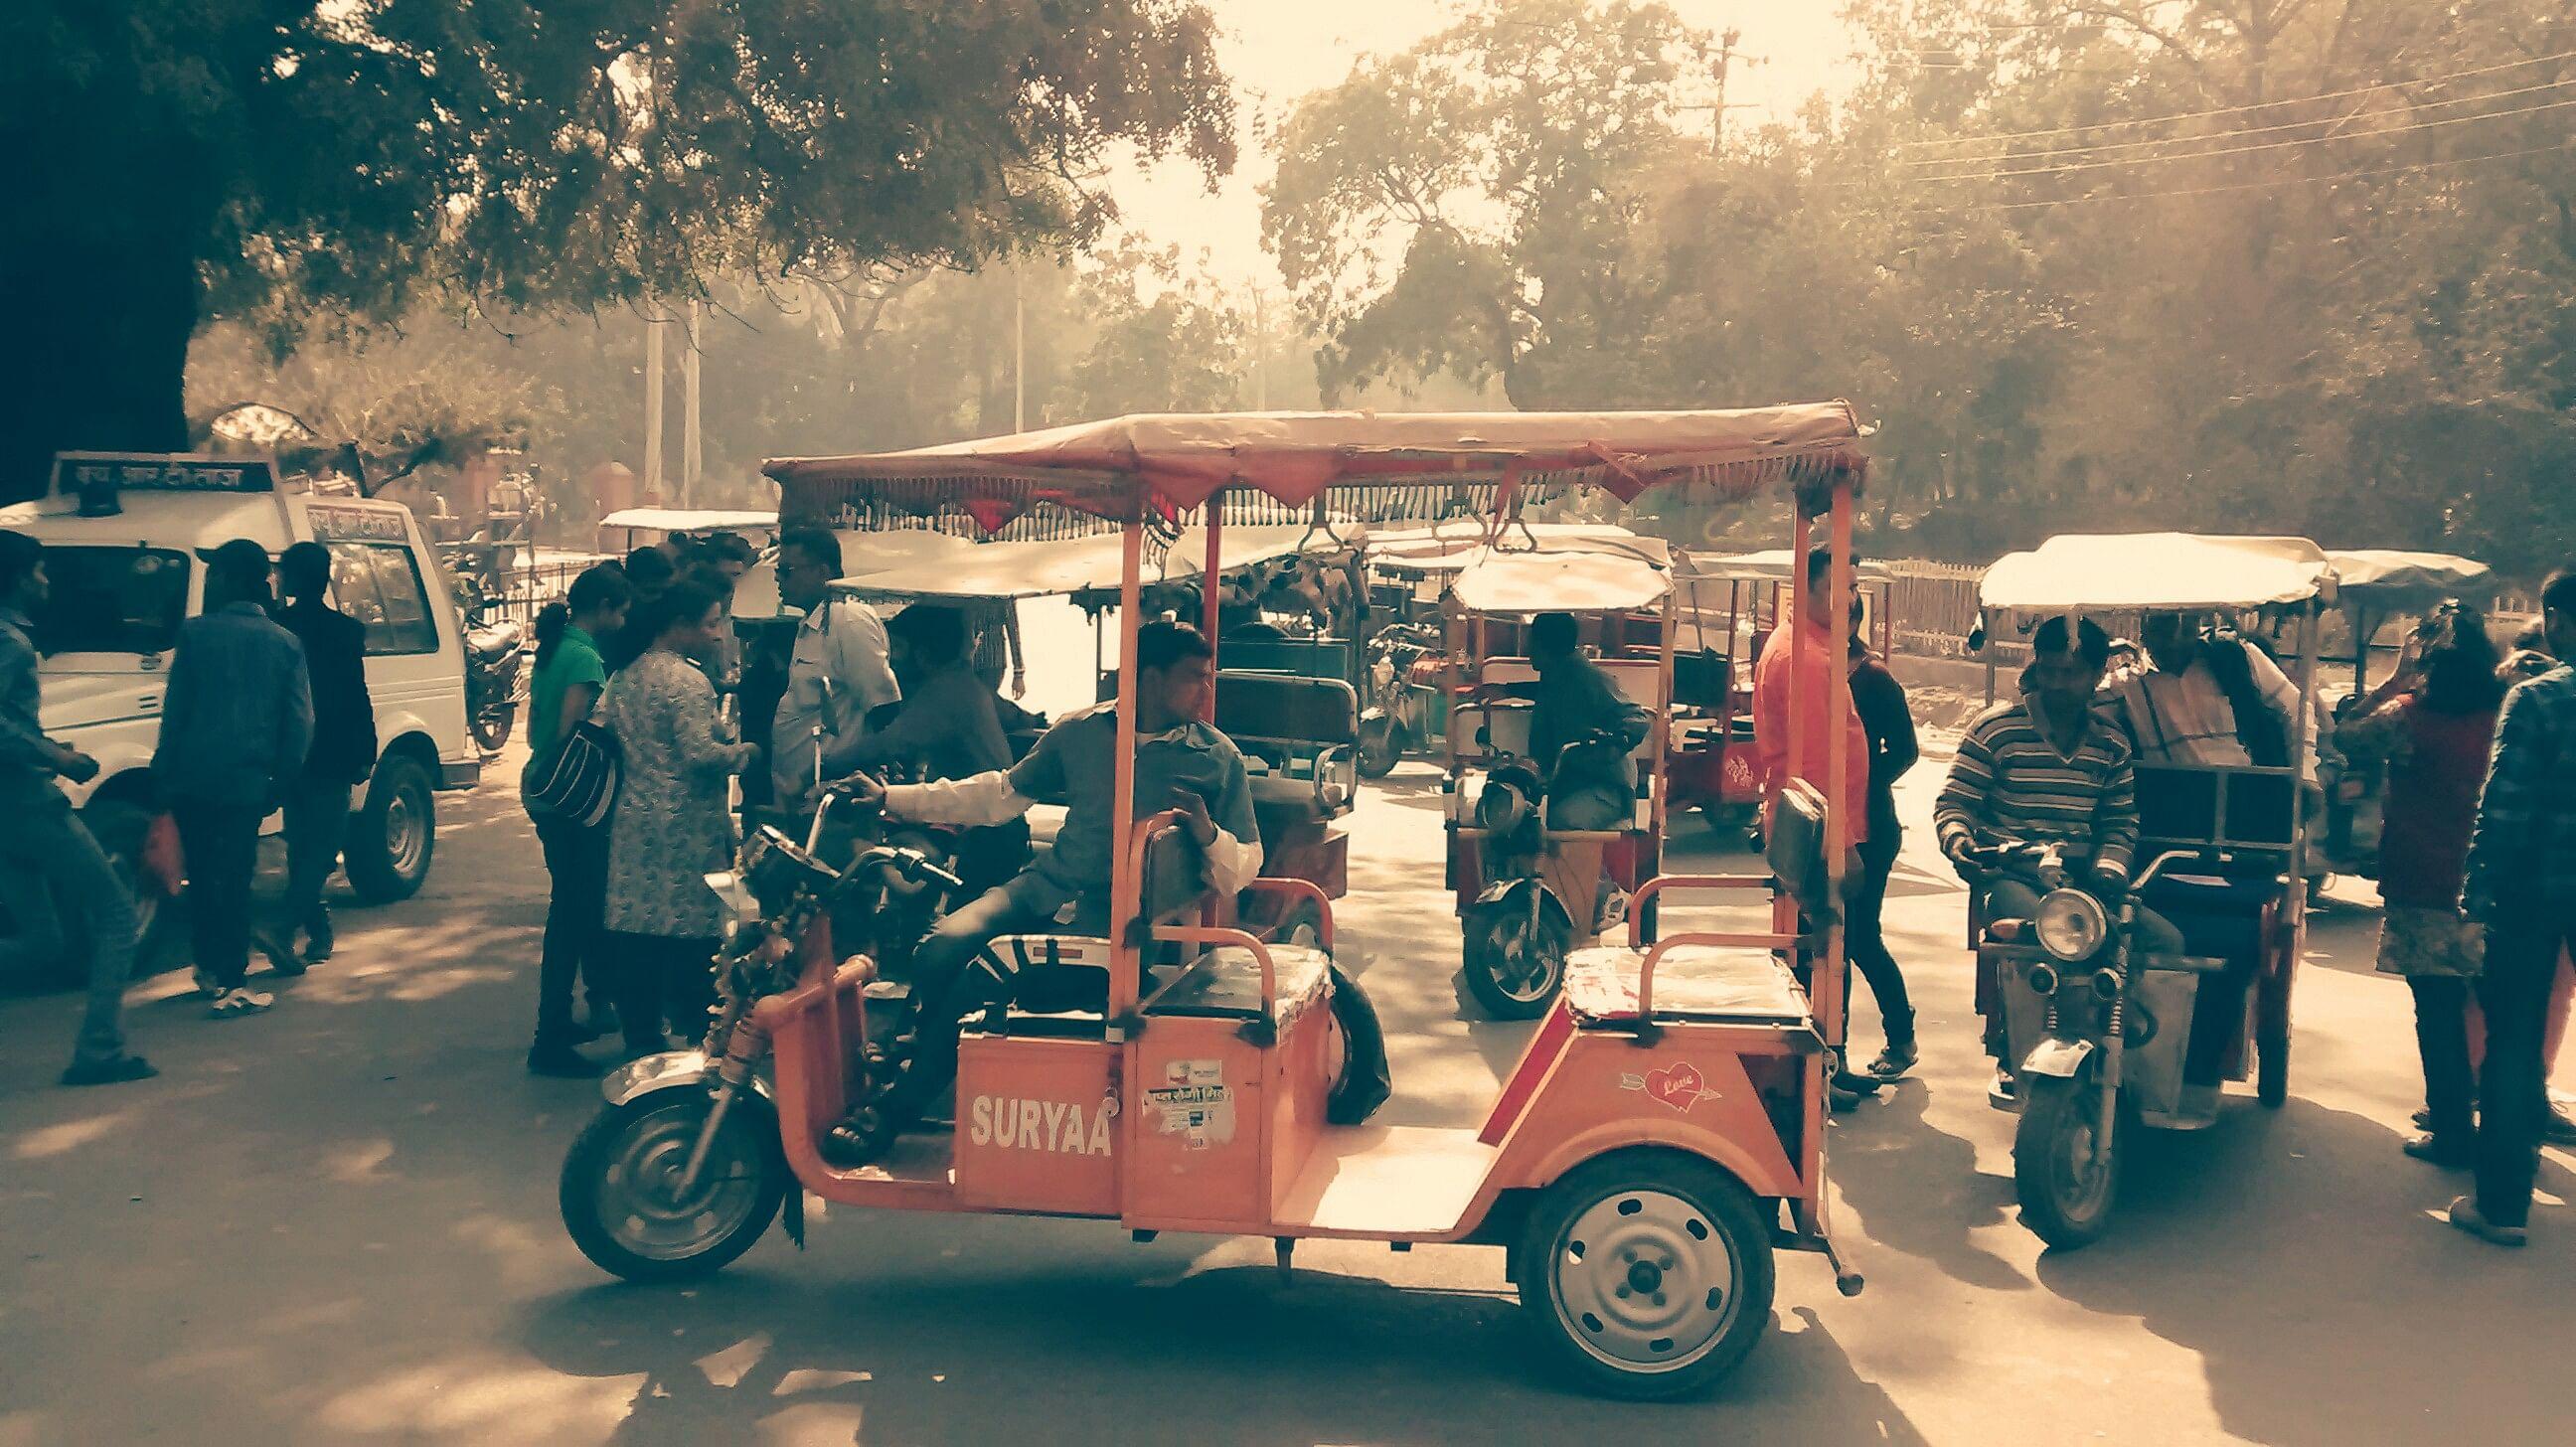 The incredible rickshaws cost as much as a regular rickshaw.